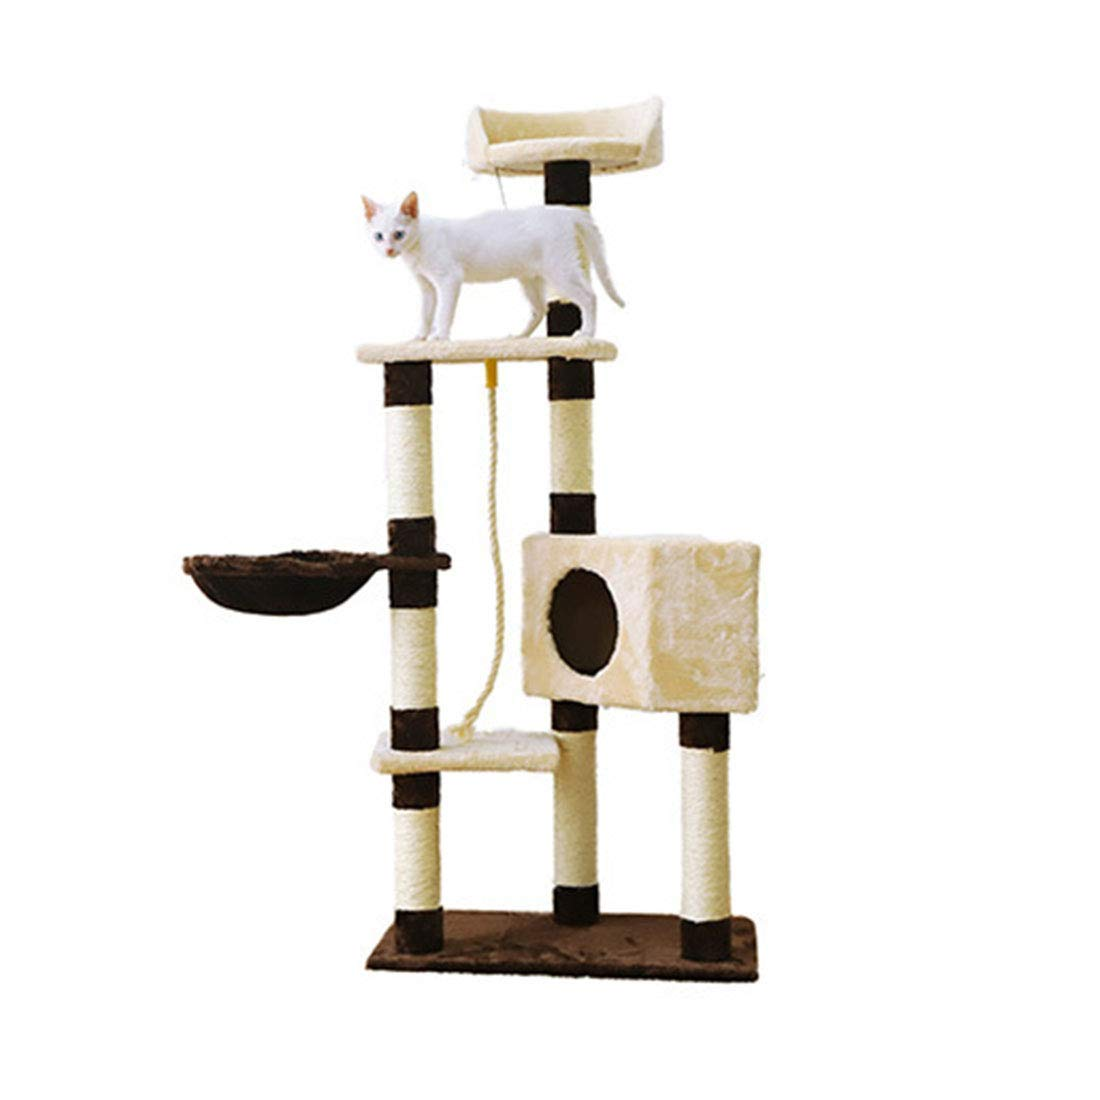 Cat climbing frame 139X60X37cm Cat climbing frame 139X60X37cm Deluxe Multi Cat Tower Cat Toys Cat Climbing Frame Cat Tree Cat Scratch Board Funny Cat Table Cat Supplies (color   Cat Climbing Frame, Size   139X60X37cm)